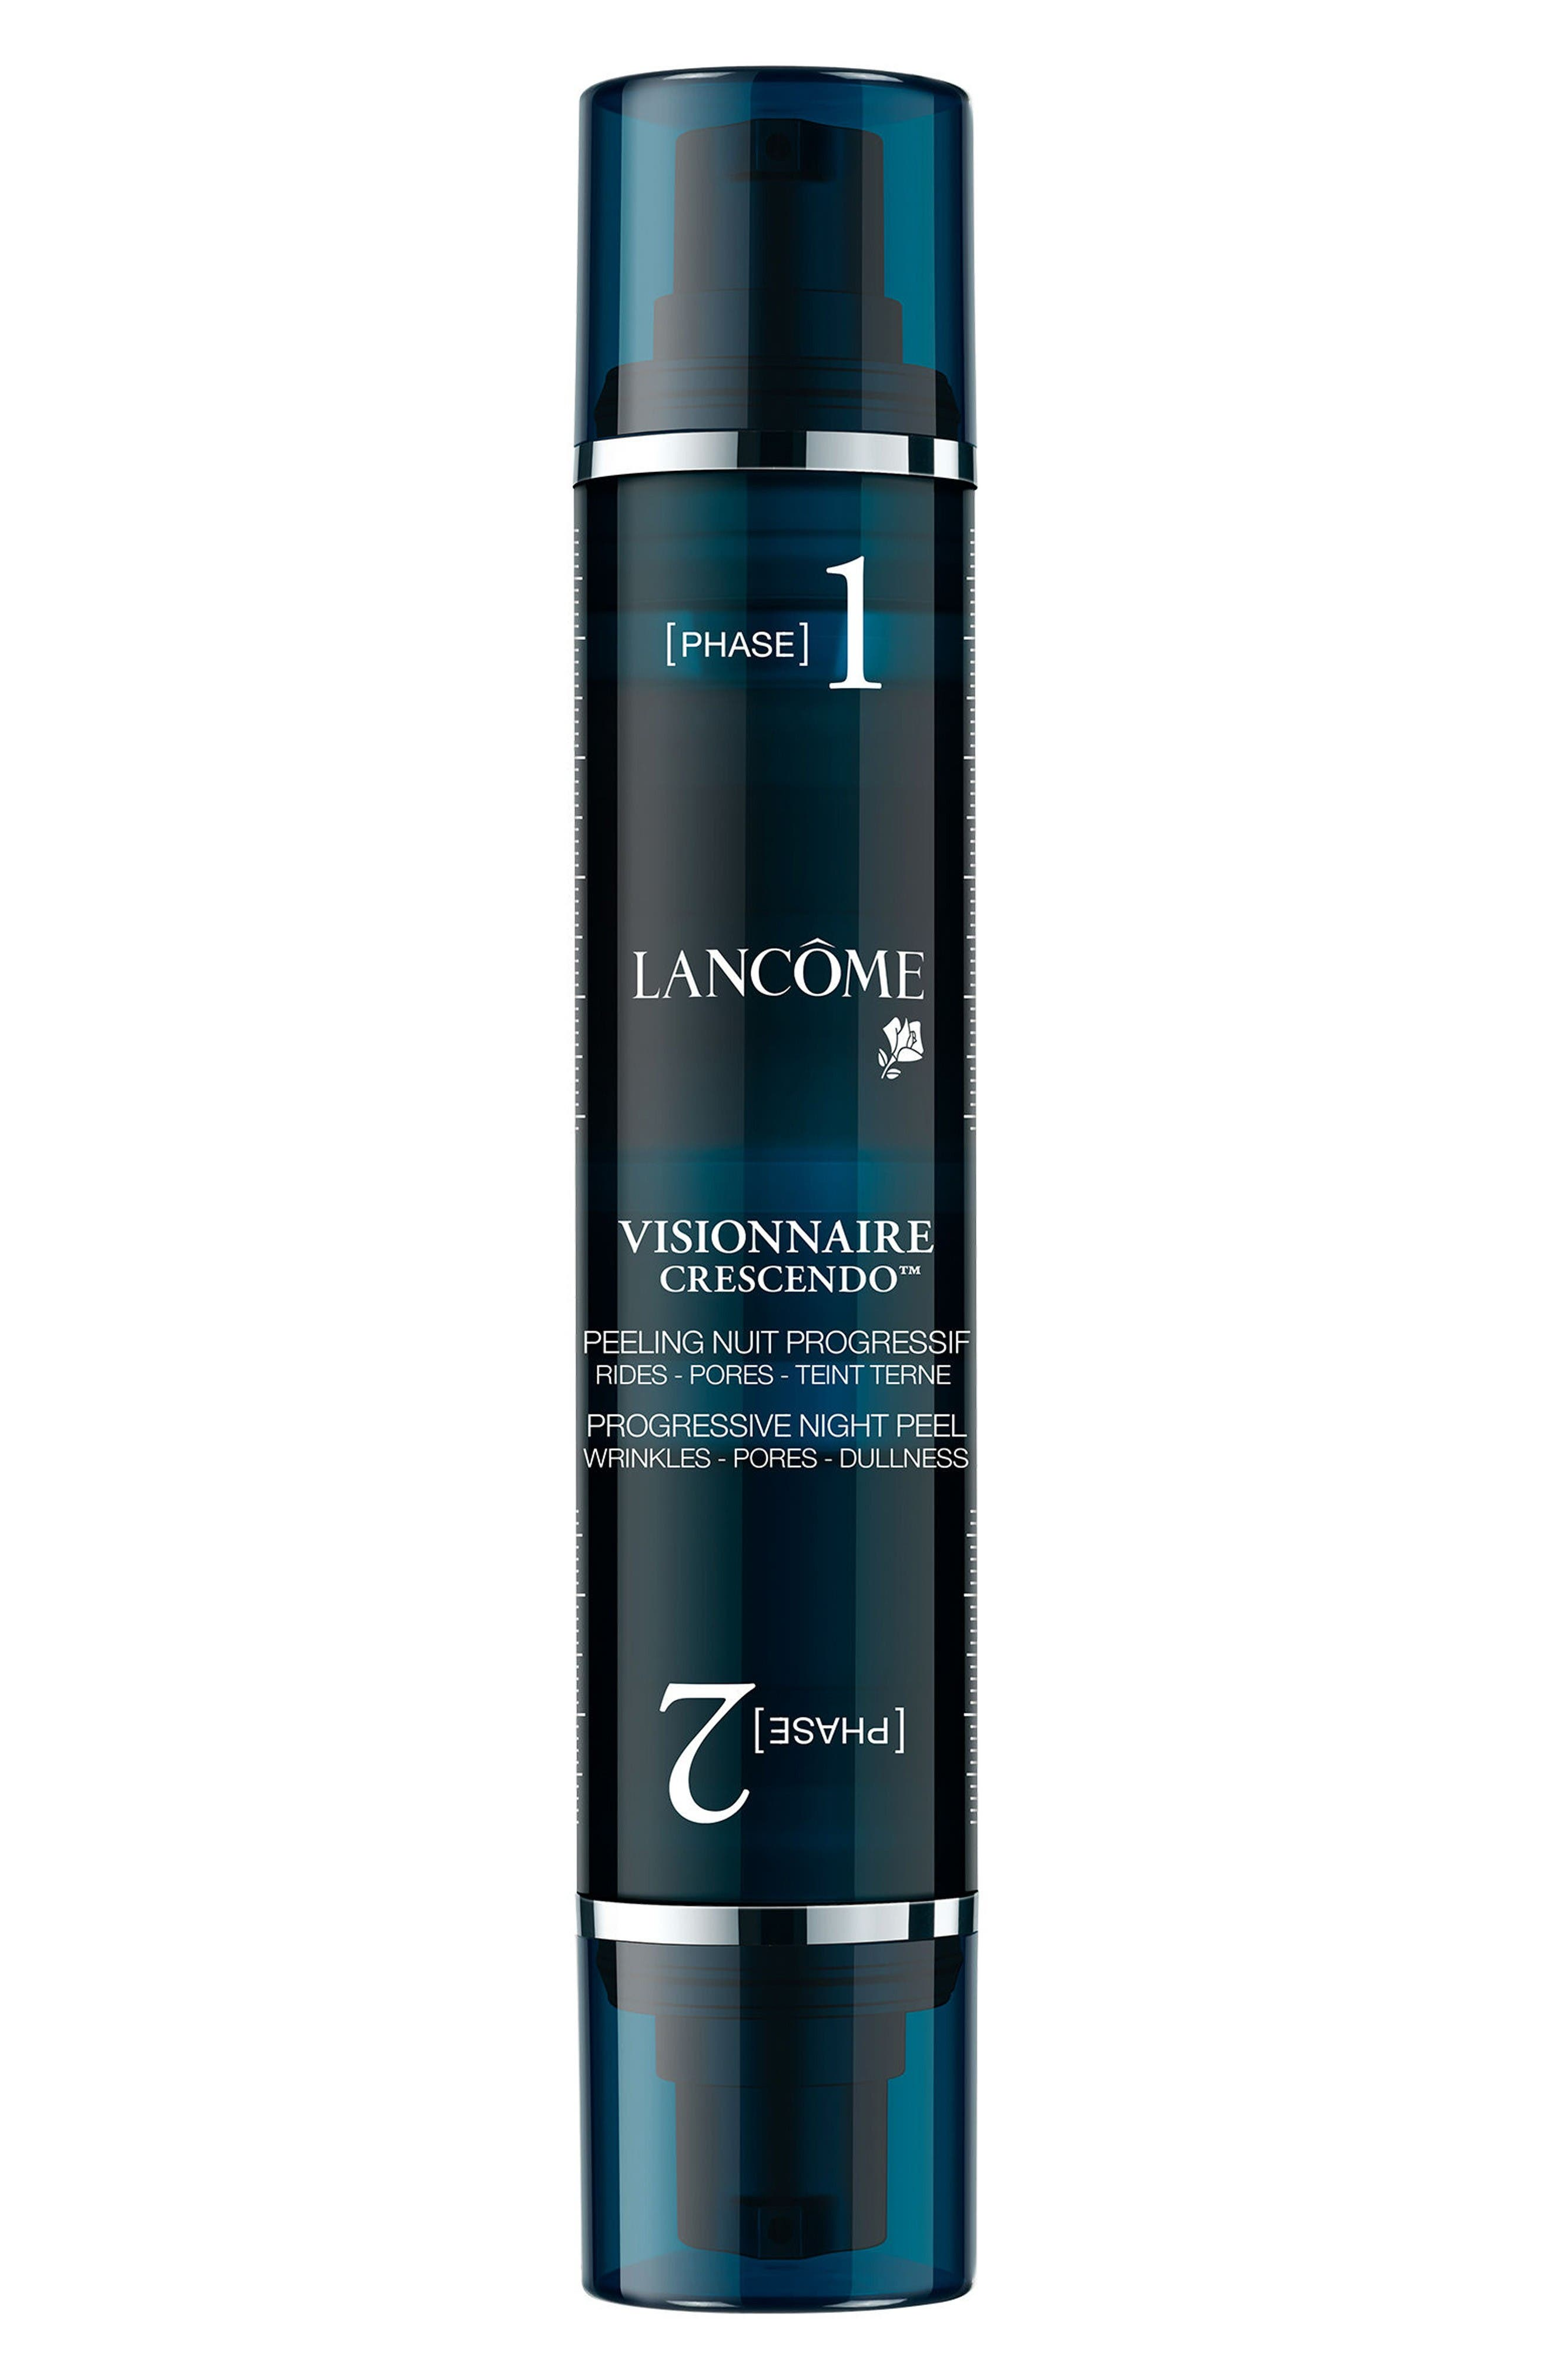 Lancôme Visionnaire Crescendo™ Progressive Night Peel